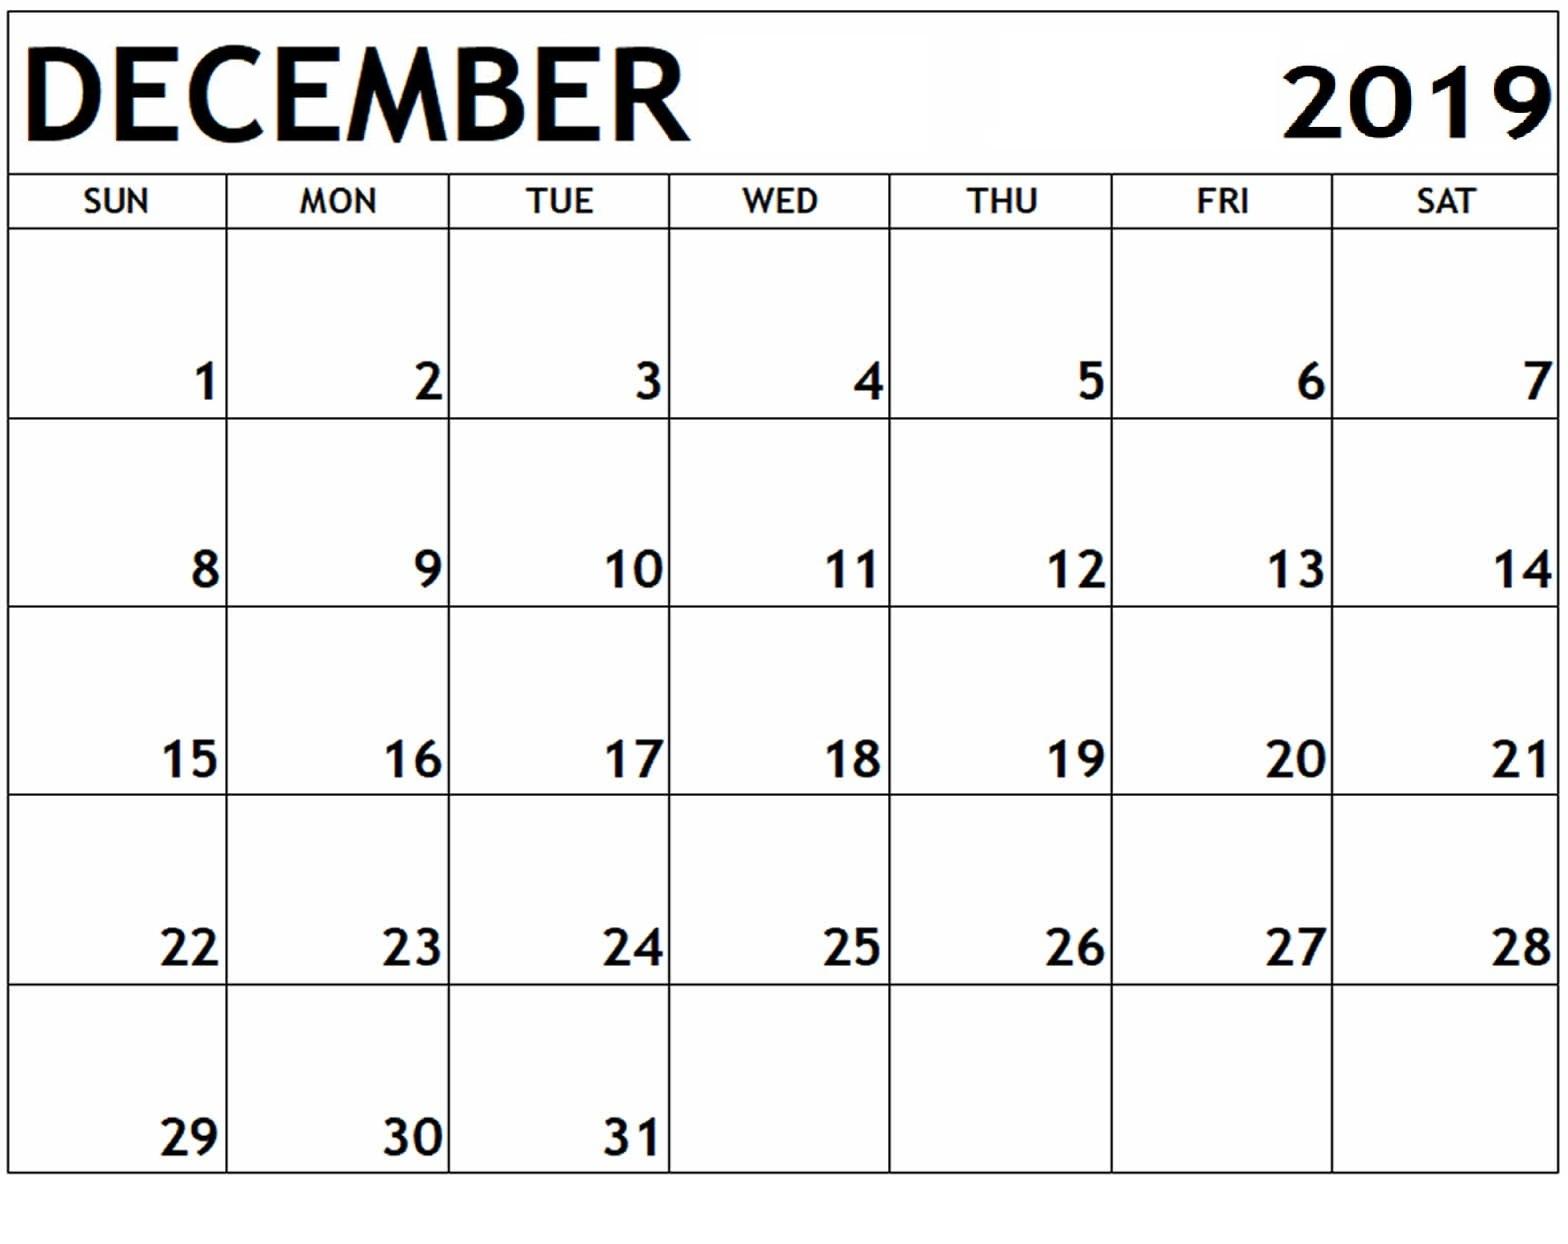 December 2019 Printable Calendar School